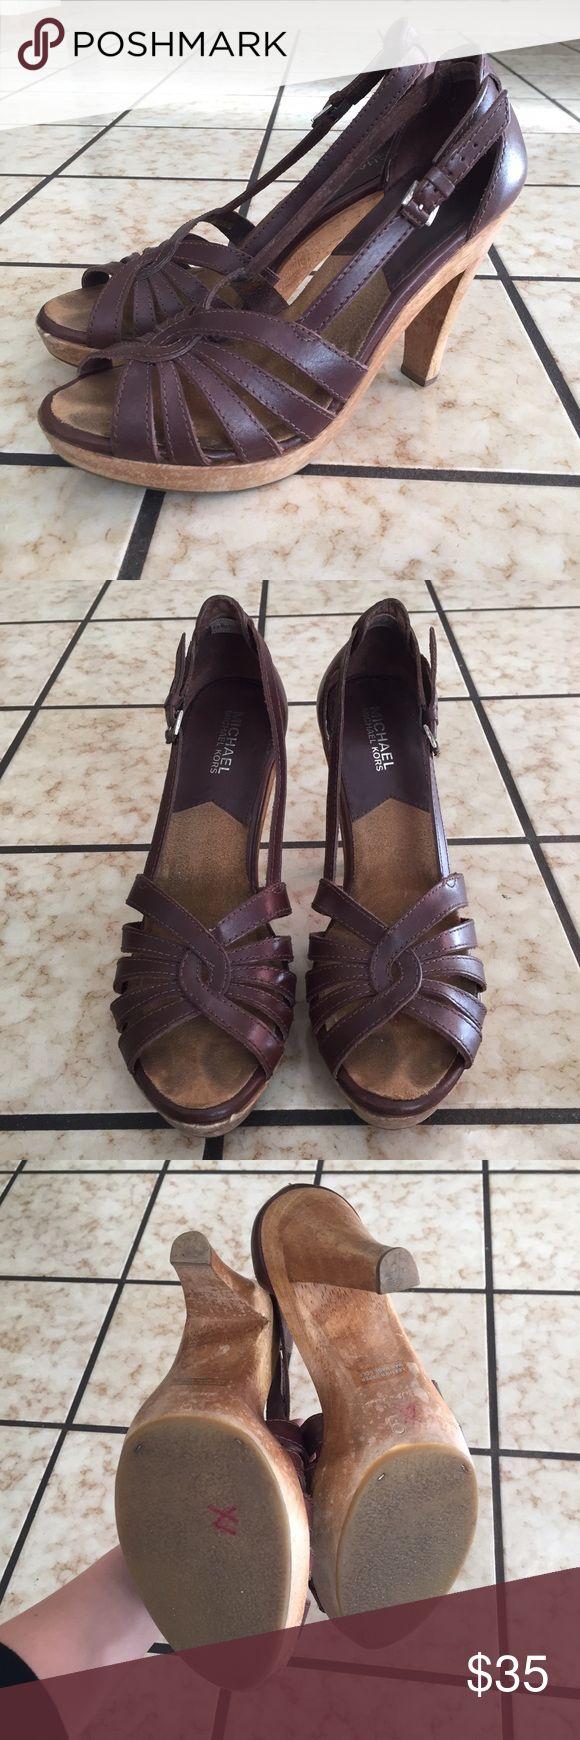 Michael by Michael kors brown heeled sandals Sz 9 Gently used Michael by Michael kors strappy brown heels sandals with a wooden heel. ~5inch heel with a ~1 inch platform MICHAEL Michael Kors Shoes Heels